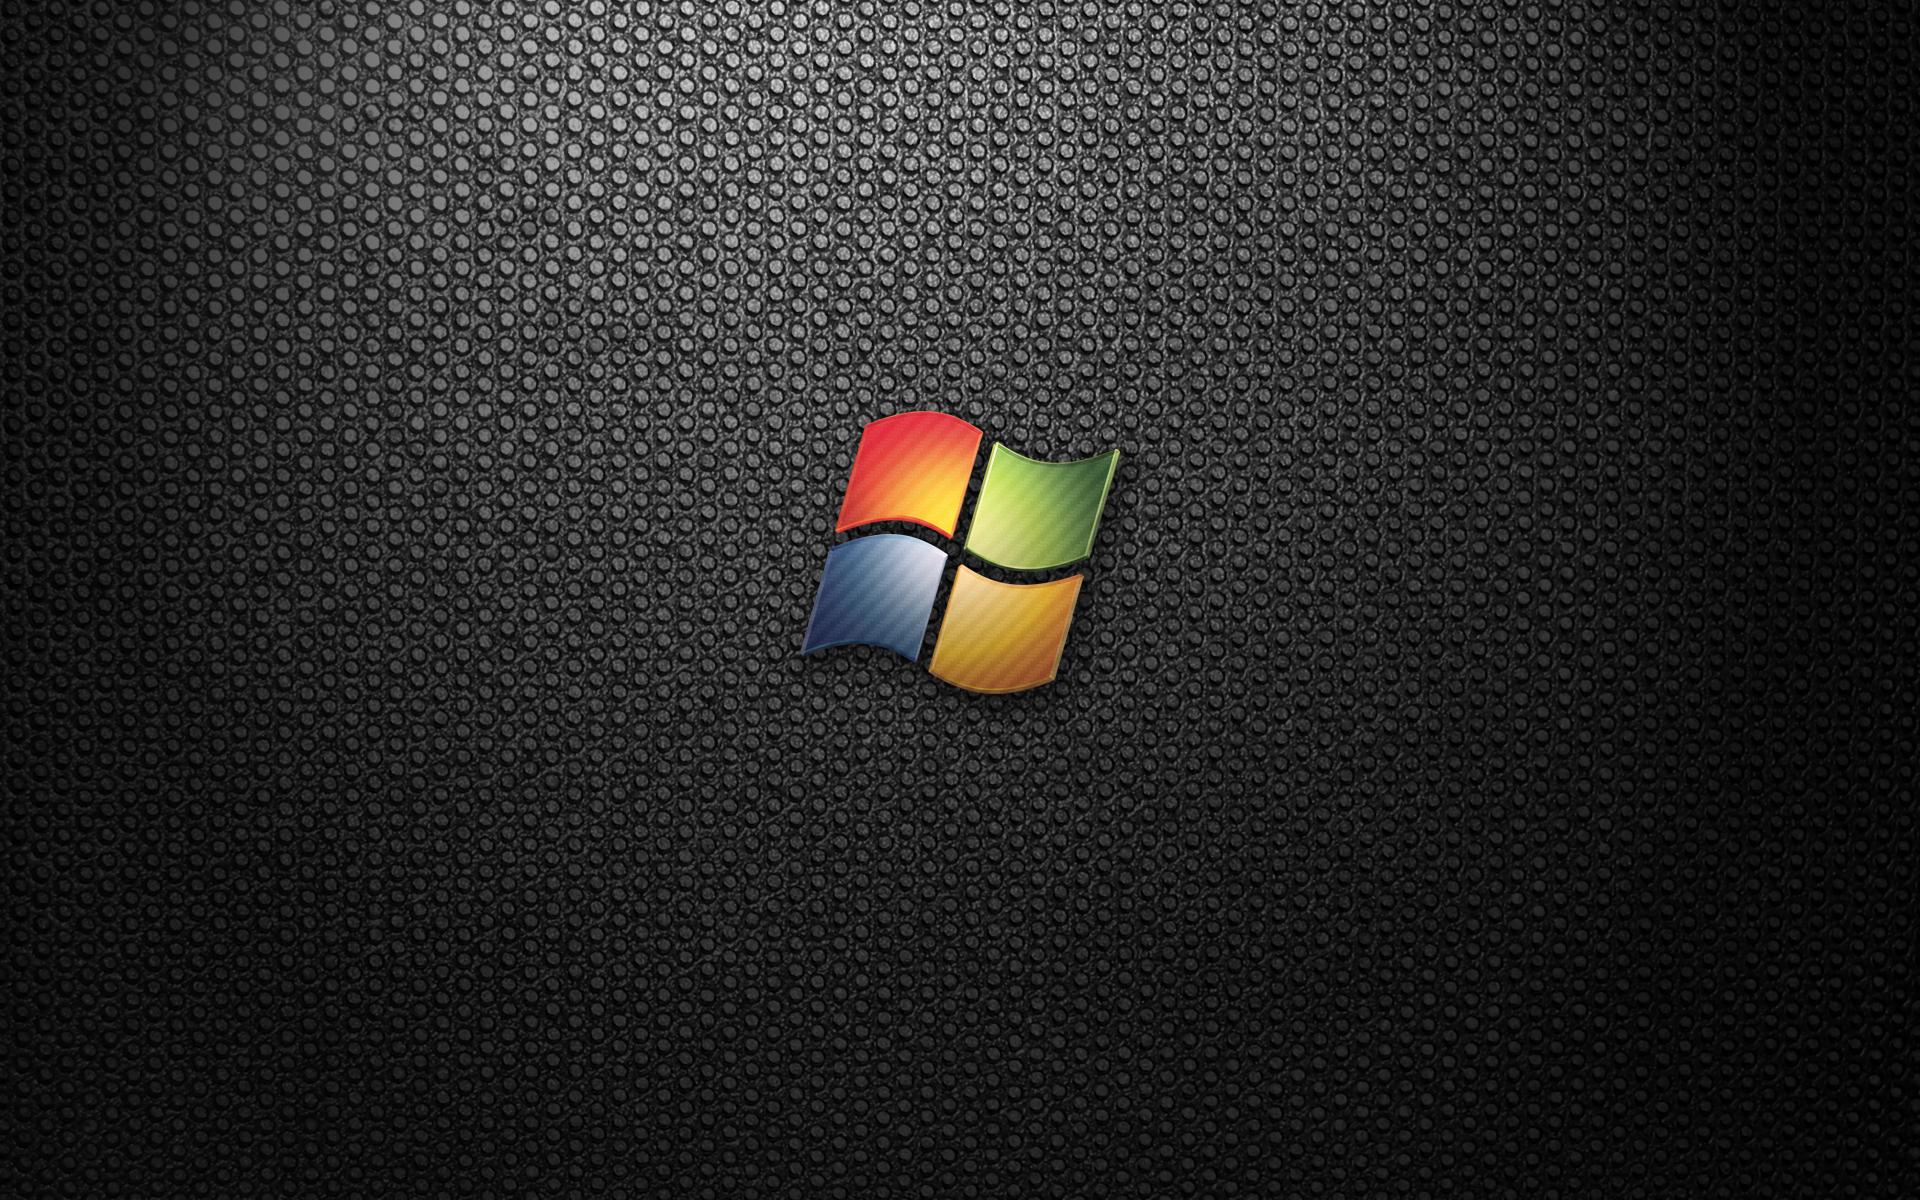 Windows 10 Wallpaper 3200x1800